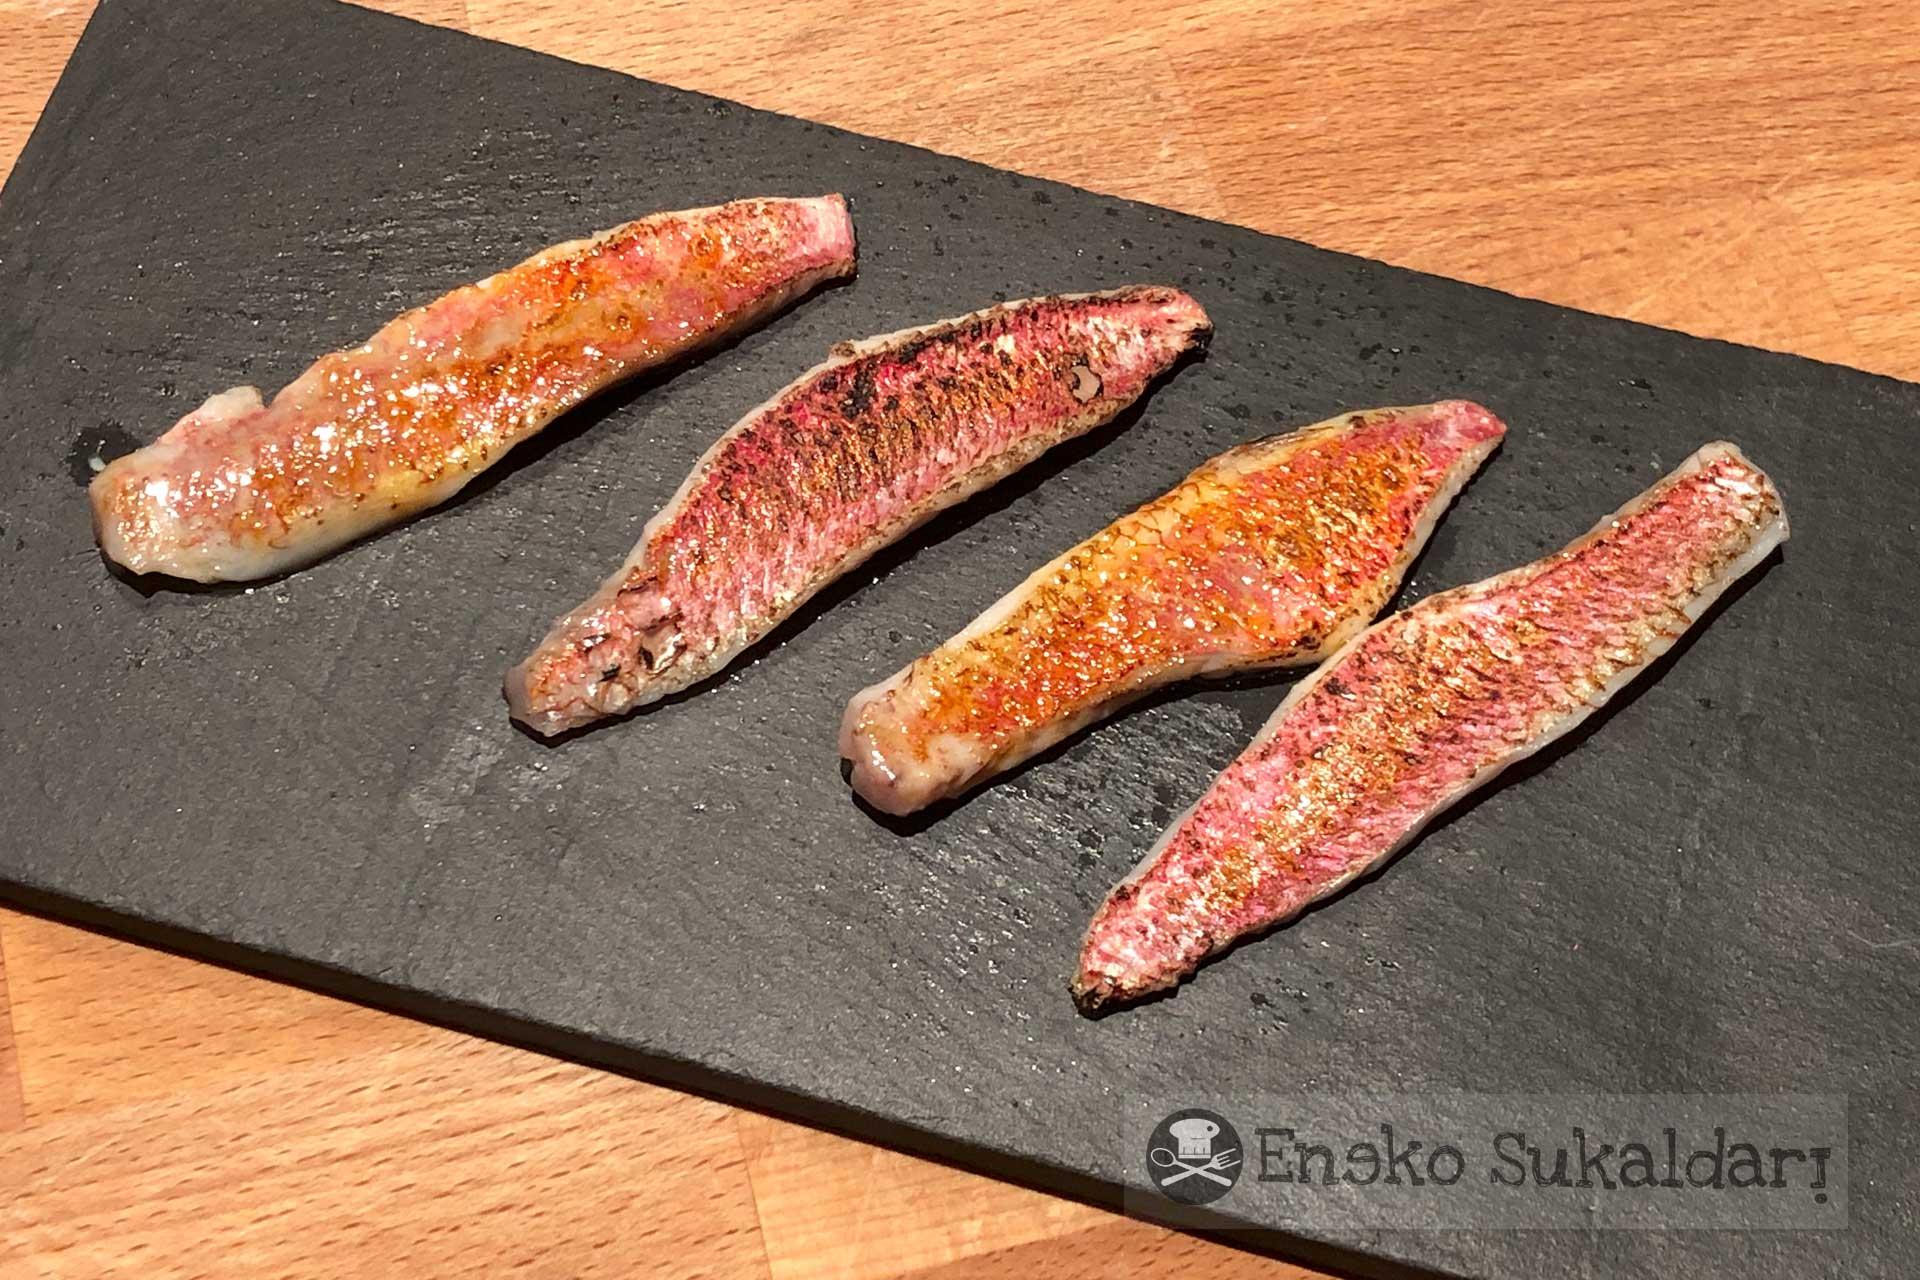 Salmorejo con salmonetes asados y trufa - Receta - Eneko sukaldari